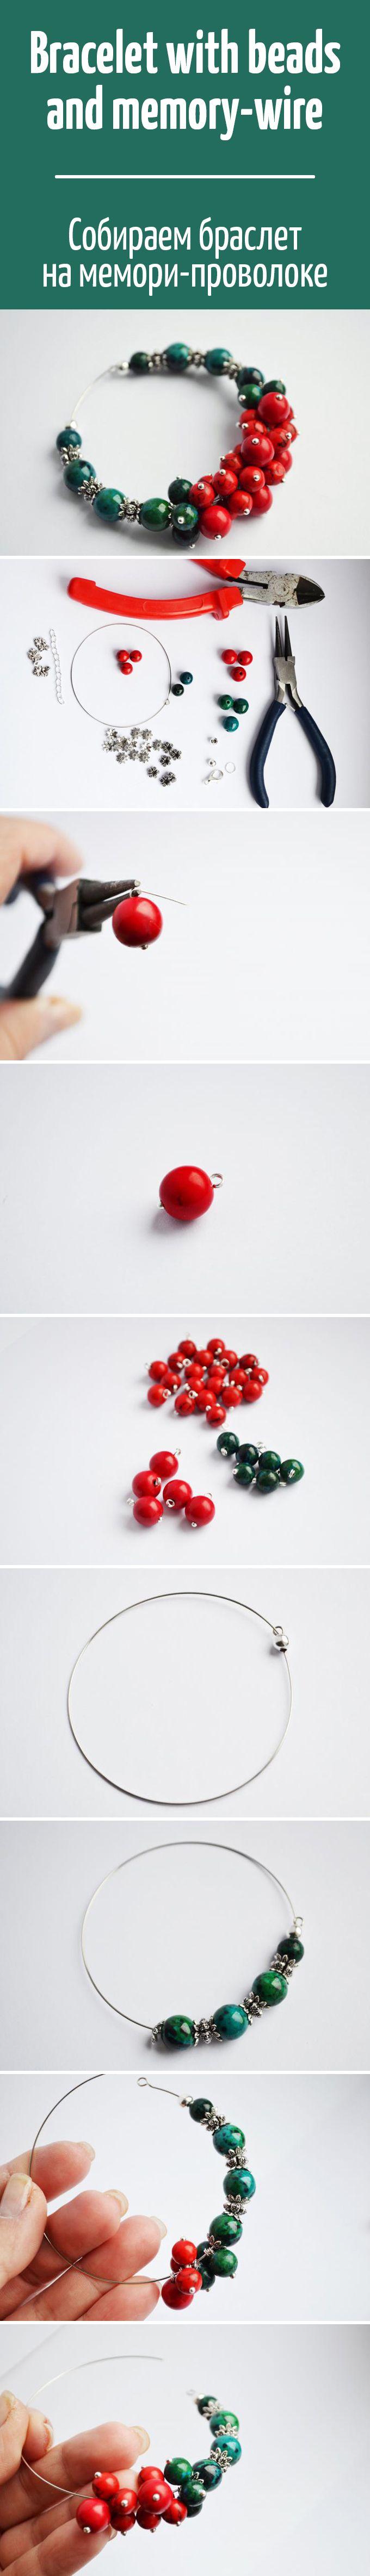 Собираем браслет из каменных бусин на мемори-проволоке / Bracelet with beads and memory-wire